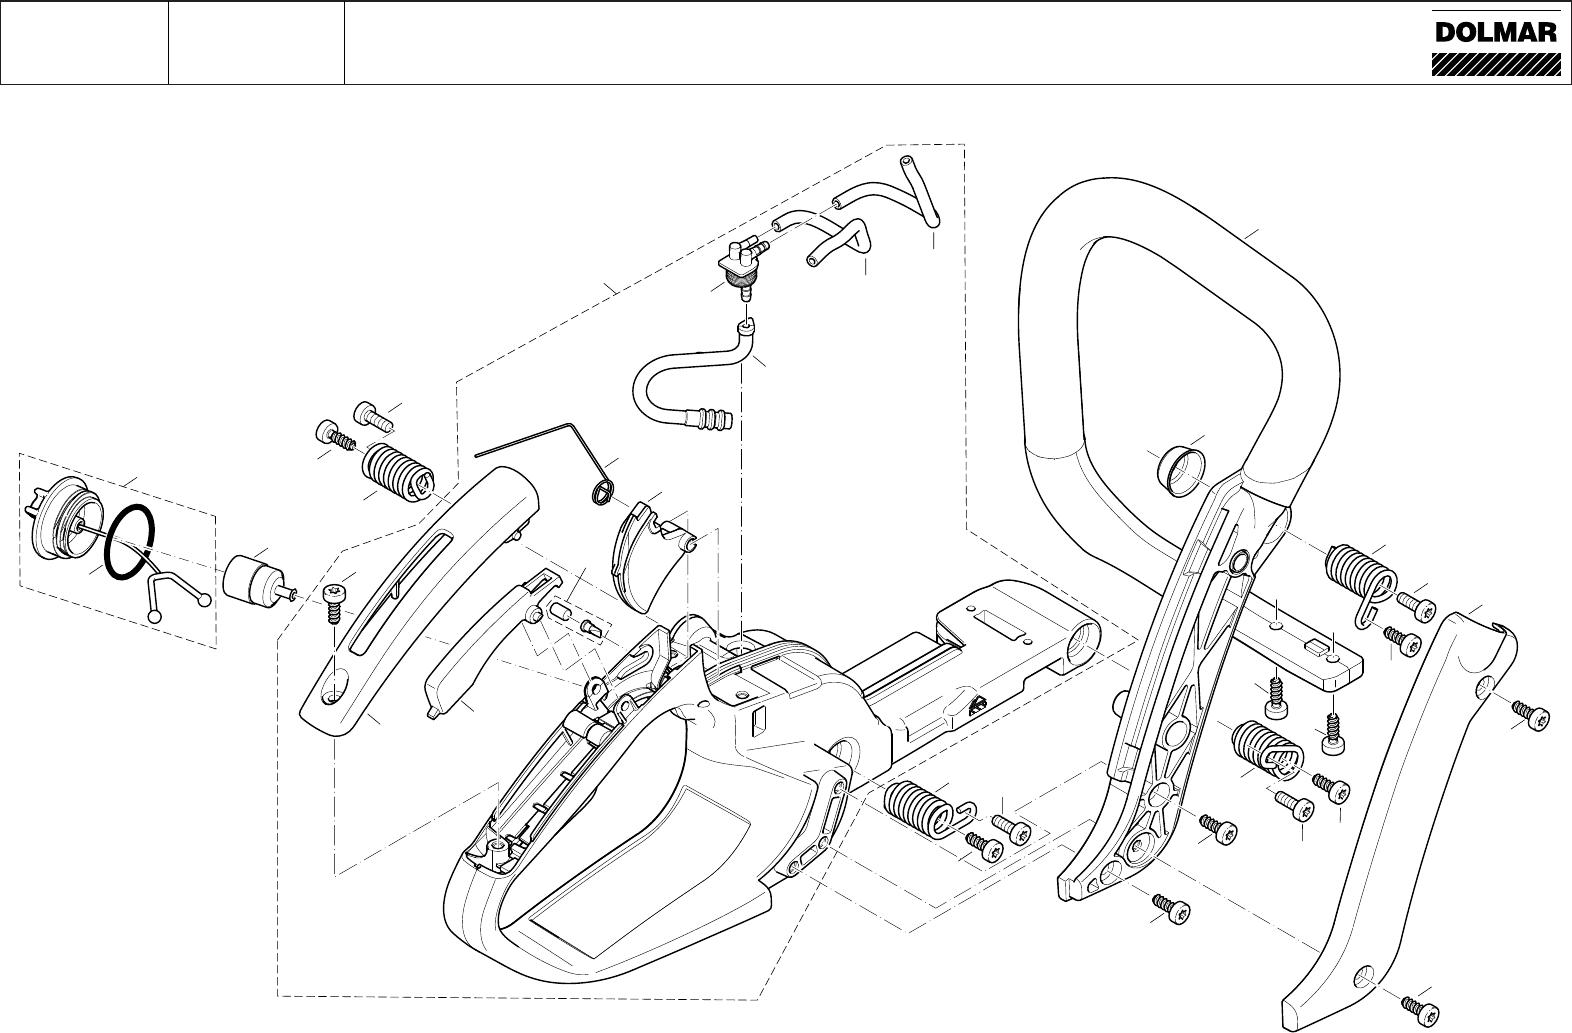 1 olas anillo obturador simmerring FPM//interurbana//Viton ® 10x18x4 mm as = qué = DASL = TC